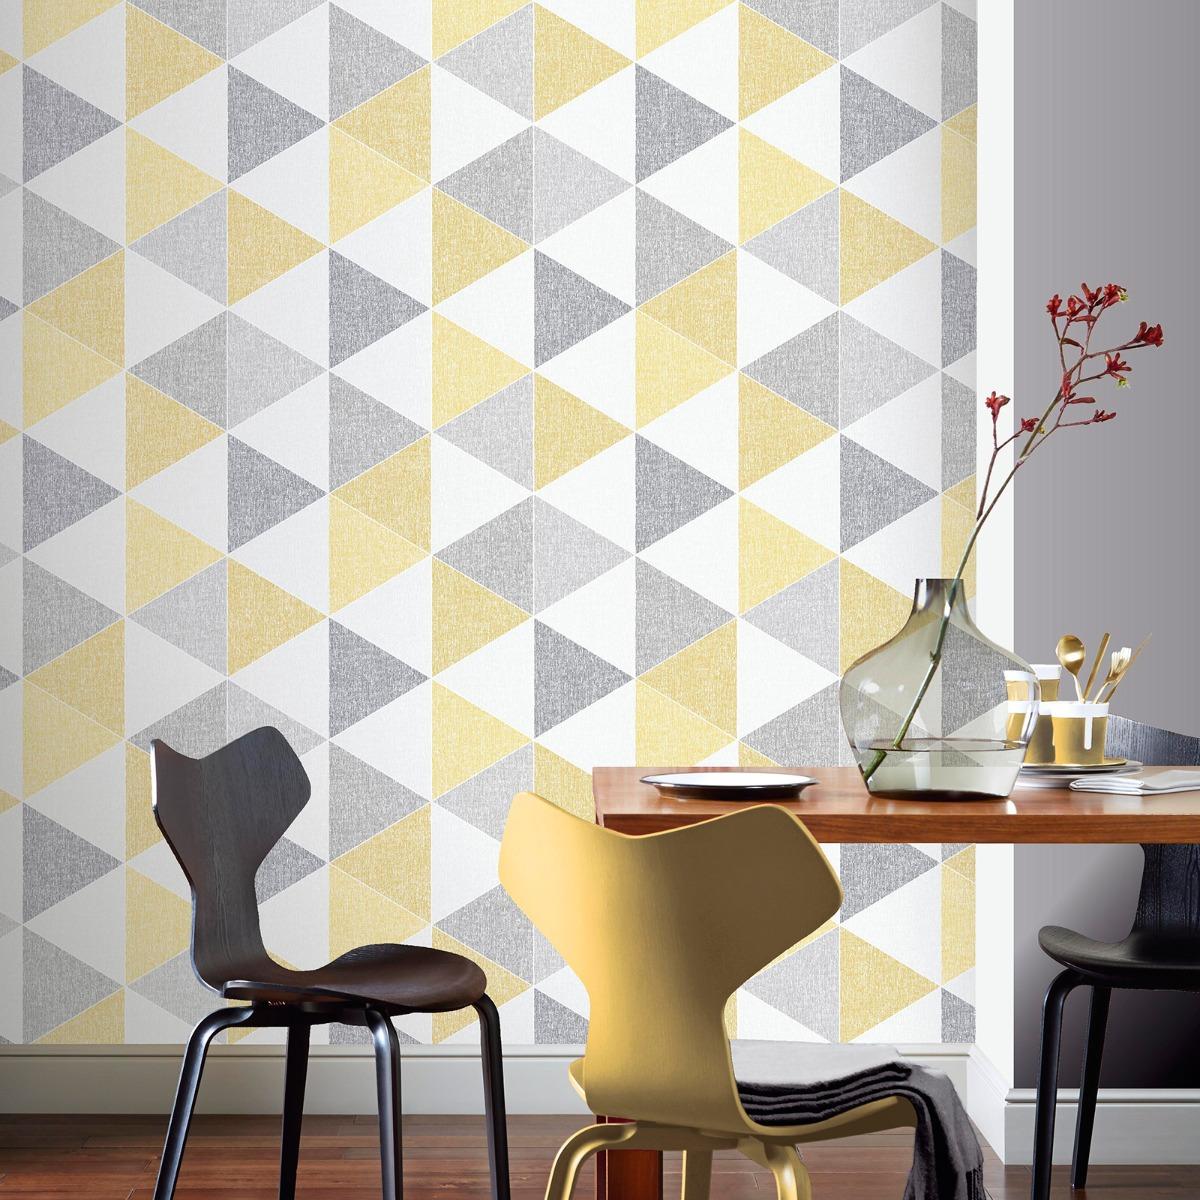 Scandi Geo Triangle Wallpaper - Yellow and Grey - Arthouse 908206